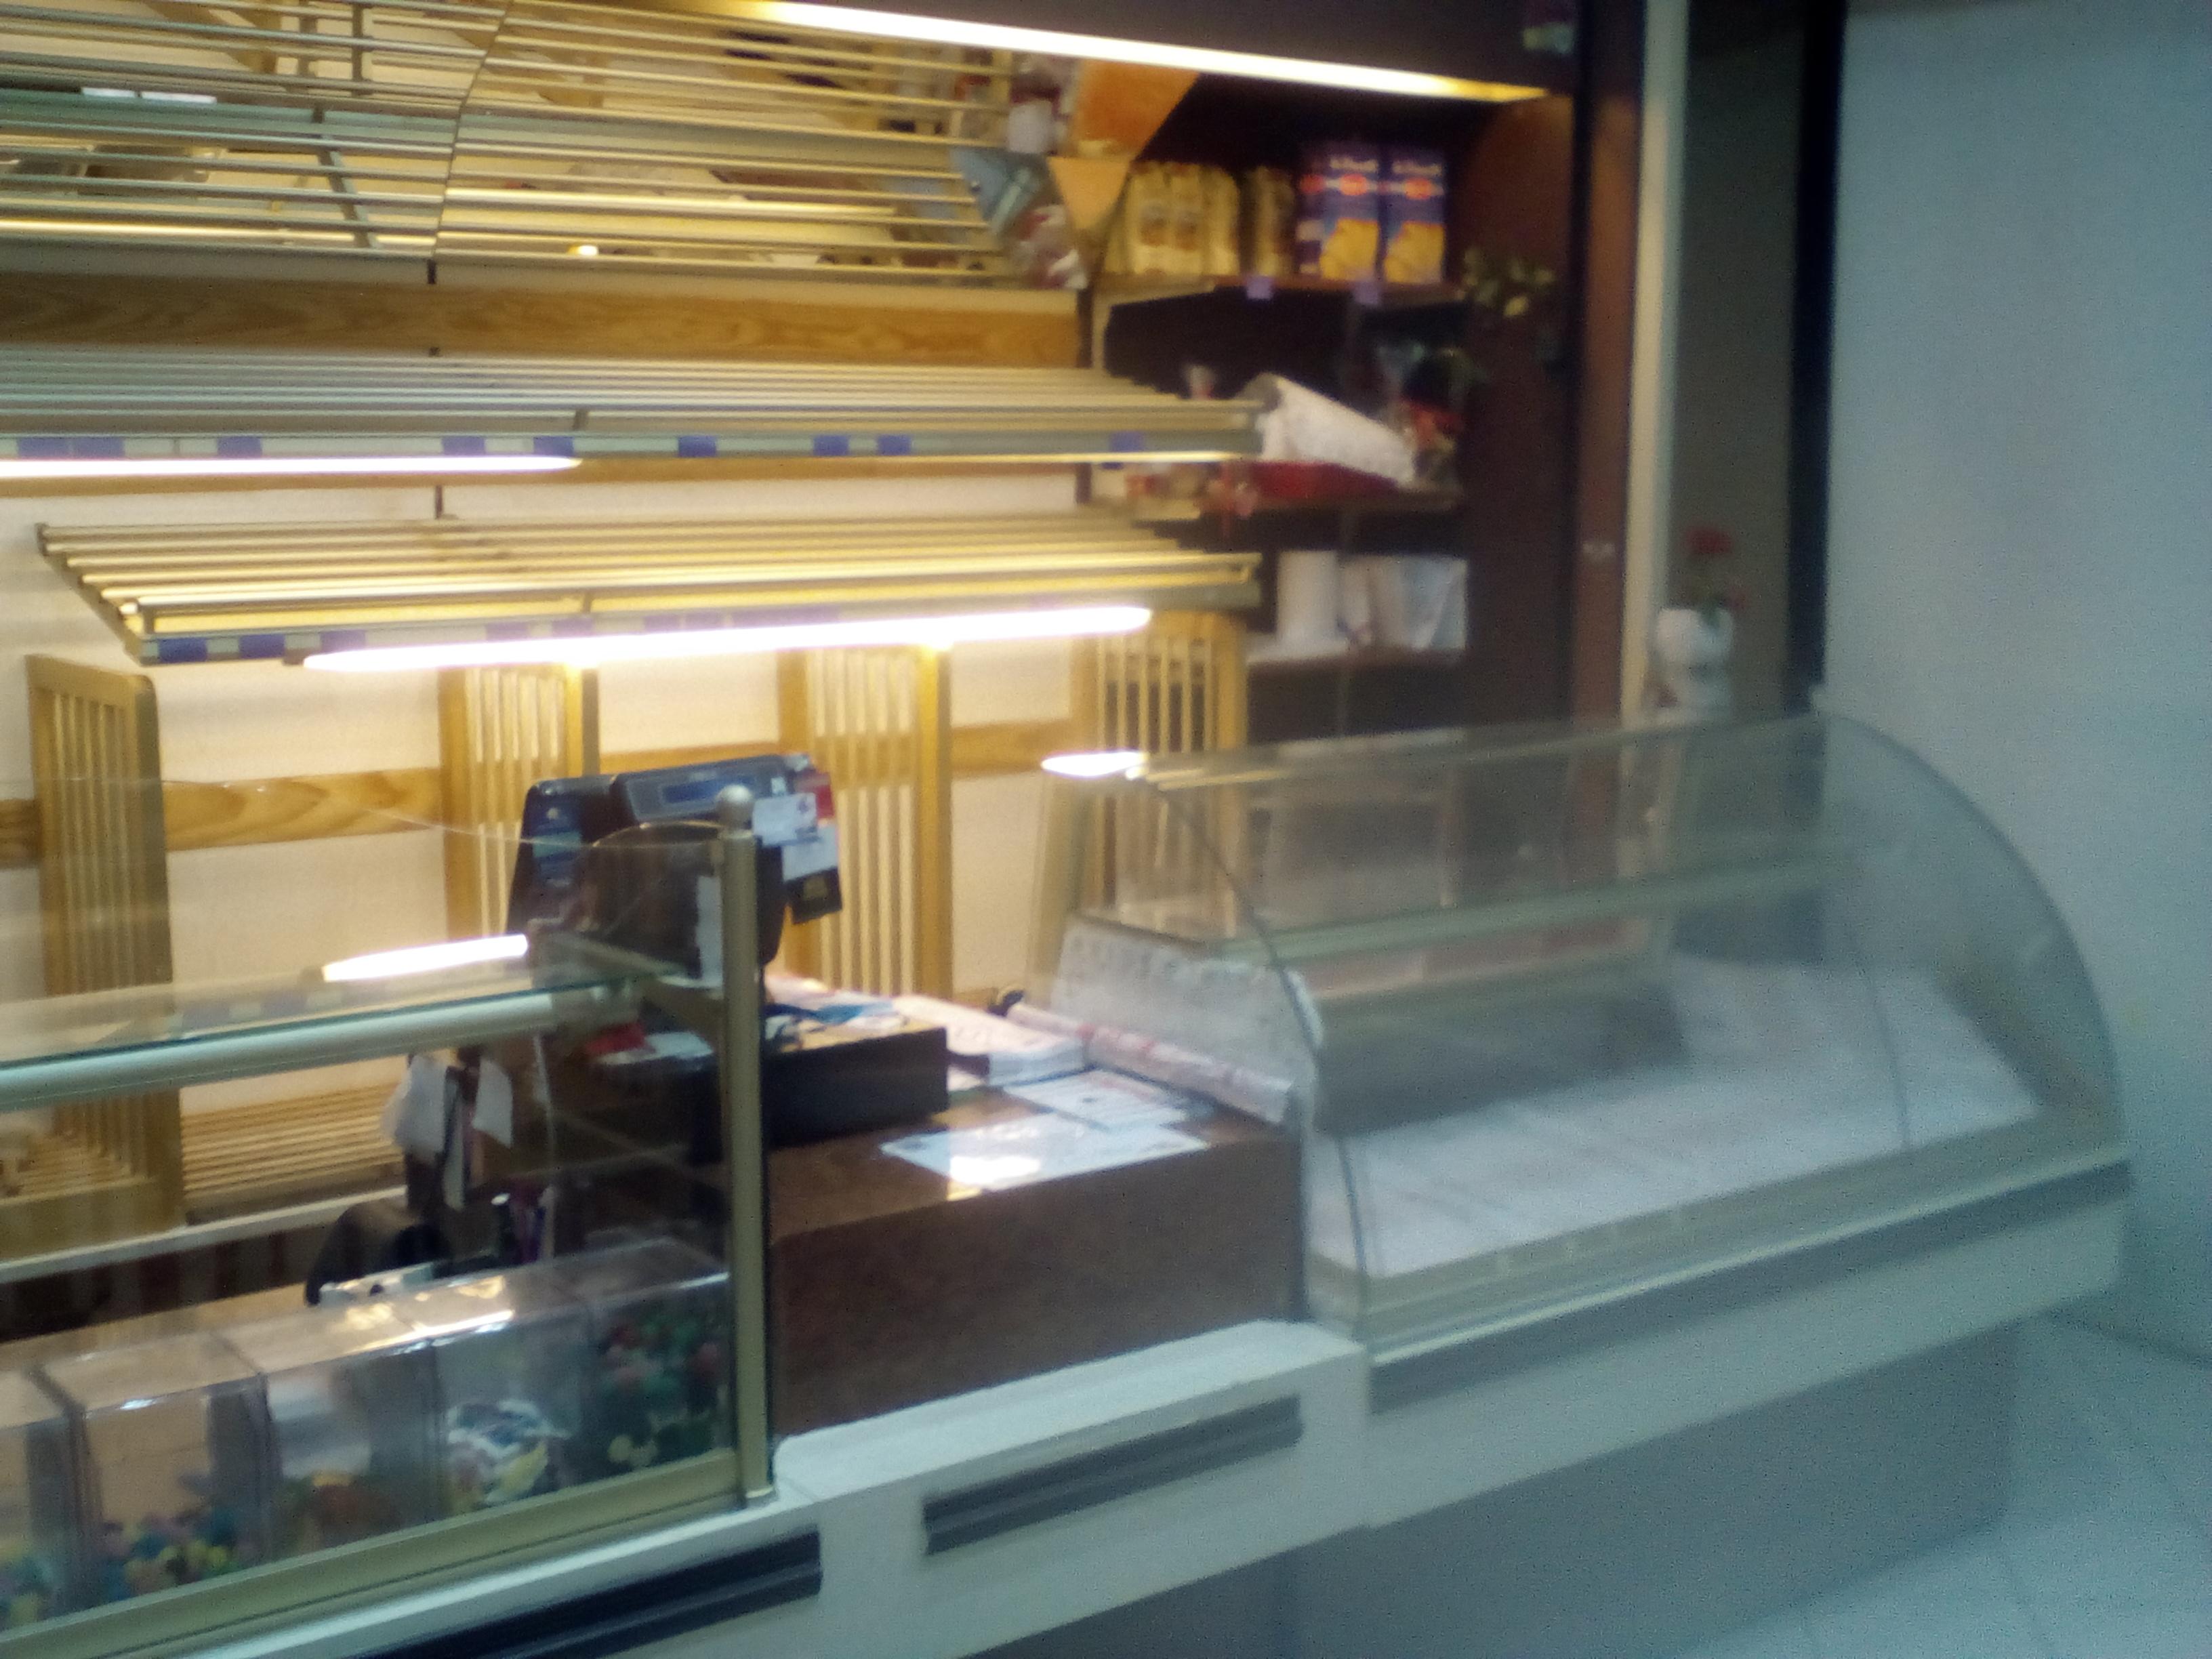 Vente Boulangerie - pâtisserie artisanale entre Lyon et Grenoble